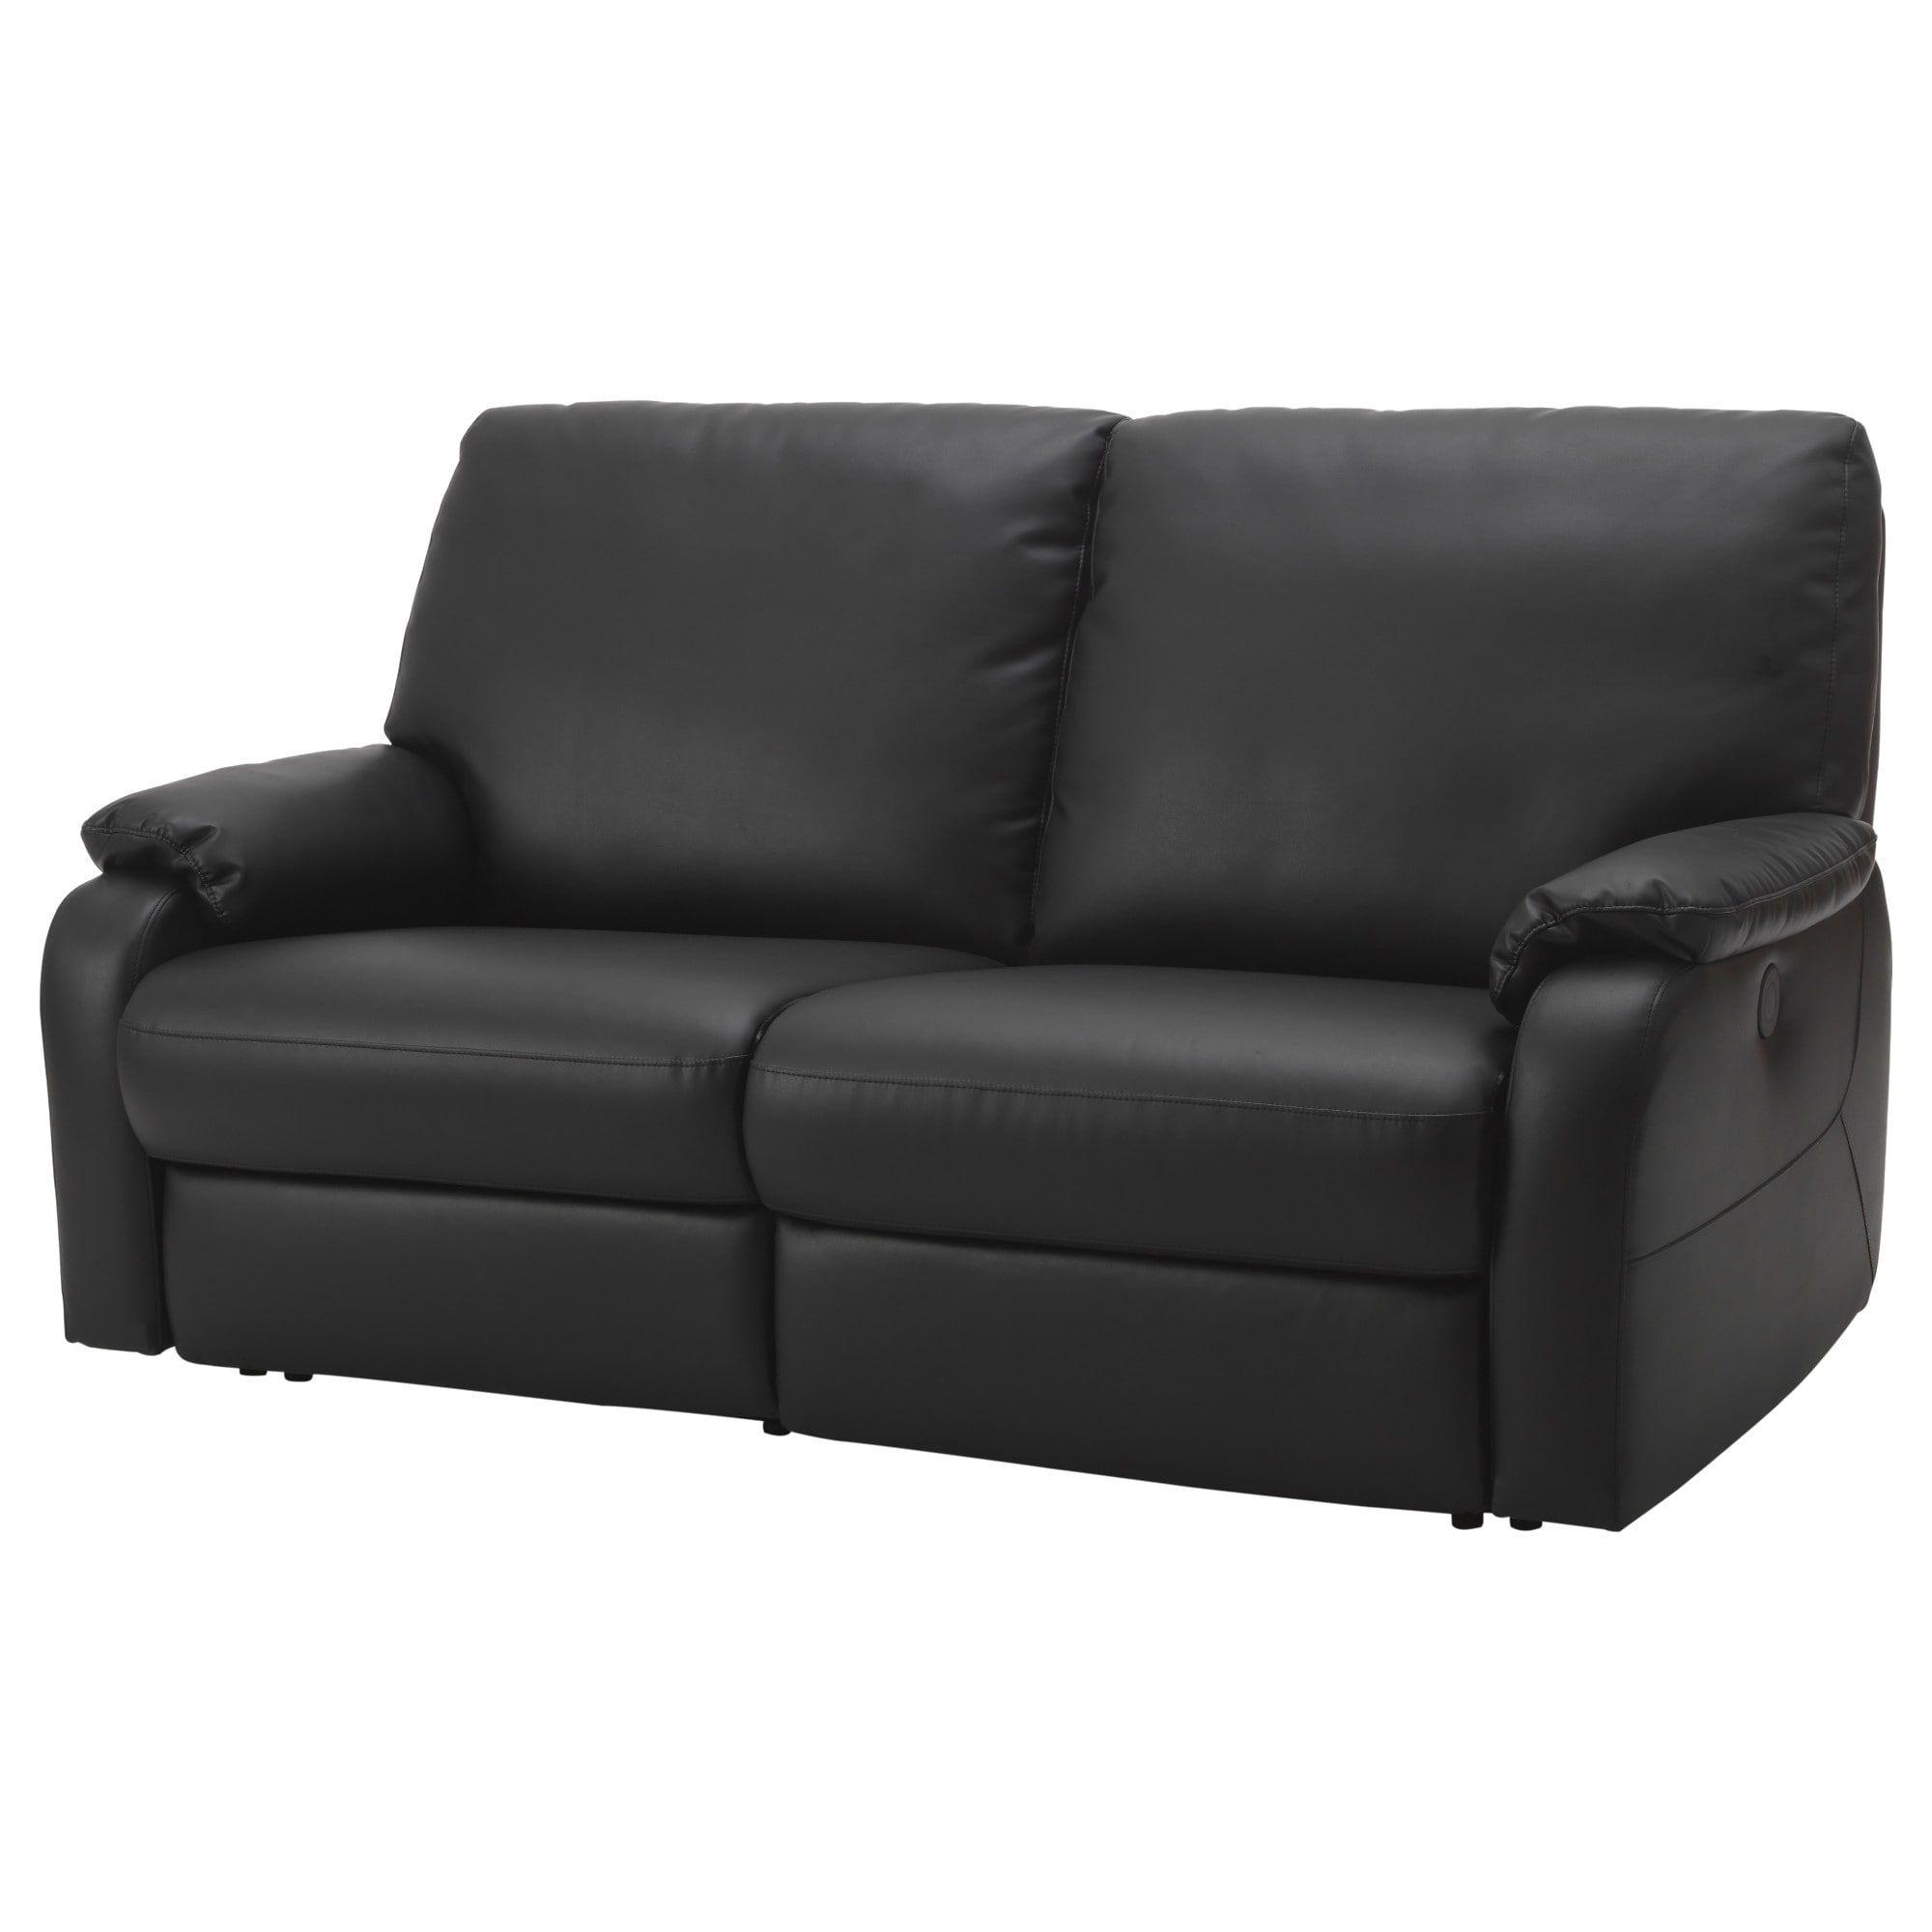 TombÄck Sofa With Adjule Seat Back Ikea